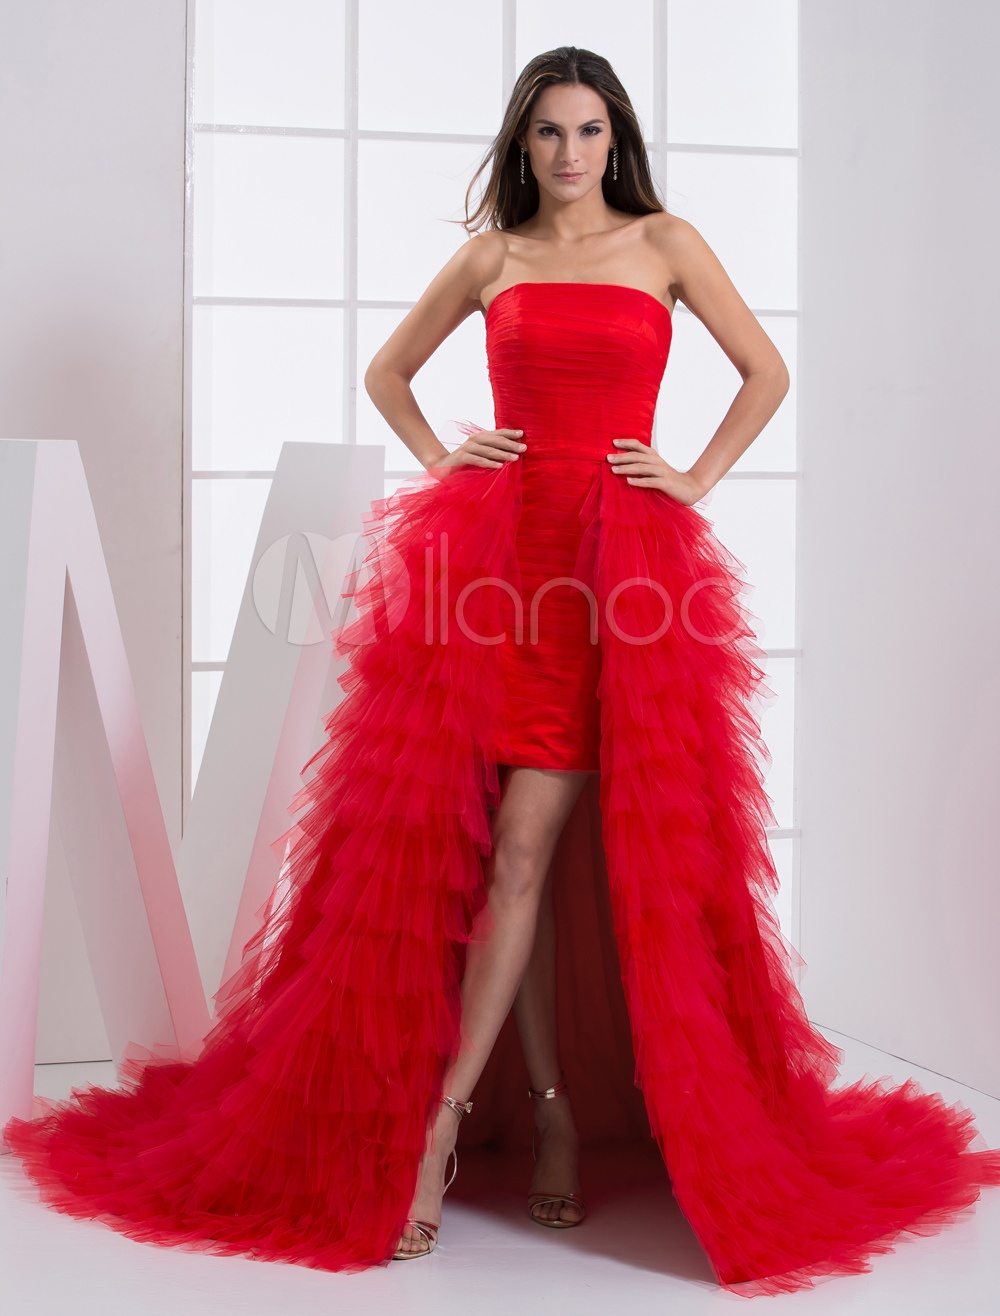 Grace Red Strapless Sleeveless Ruffles Sheath Tulle Prom Dress (Wedding Prom Dresses) photo